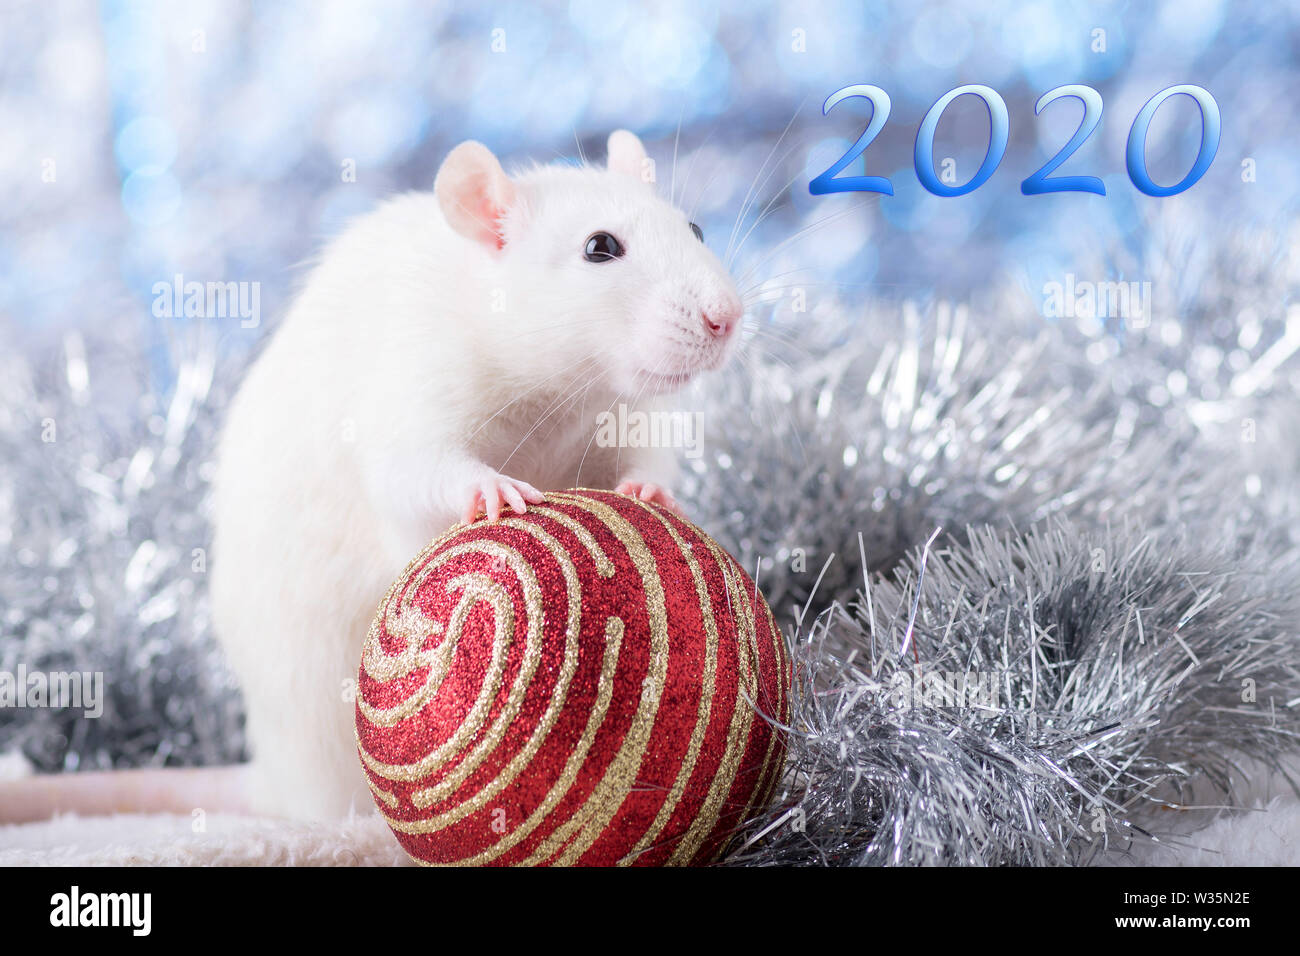 calendar 2020 photos calendar 2020 images alamy. Black Bedroom Furniture Sets. Home Design Ideas